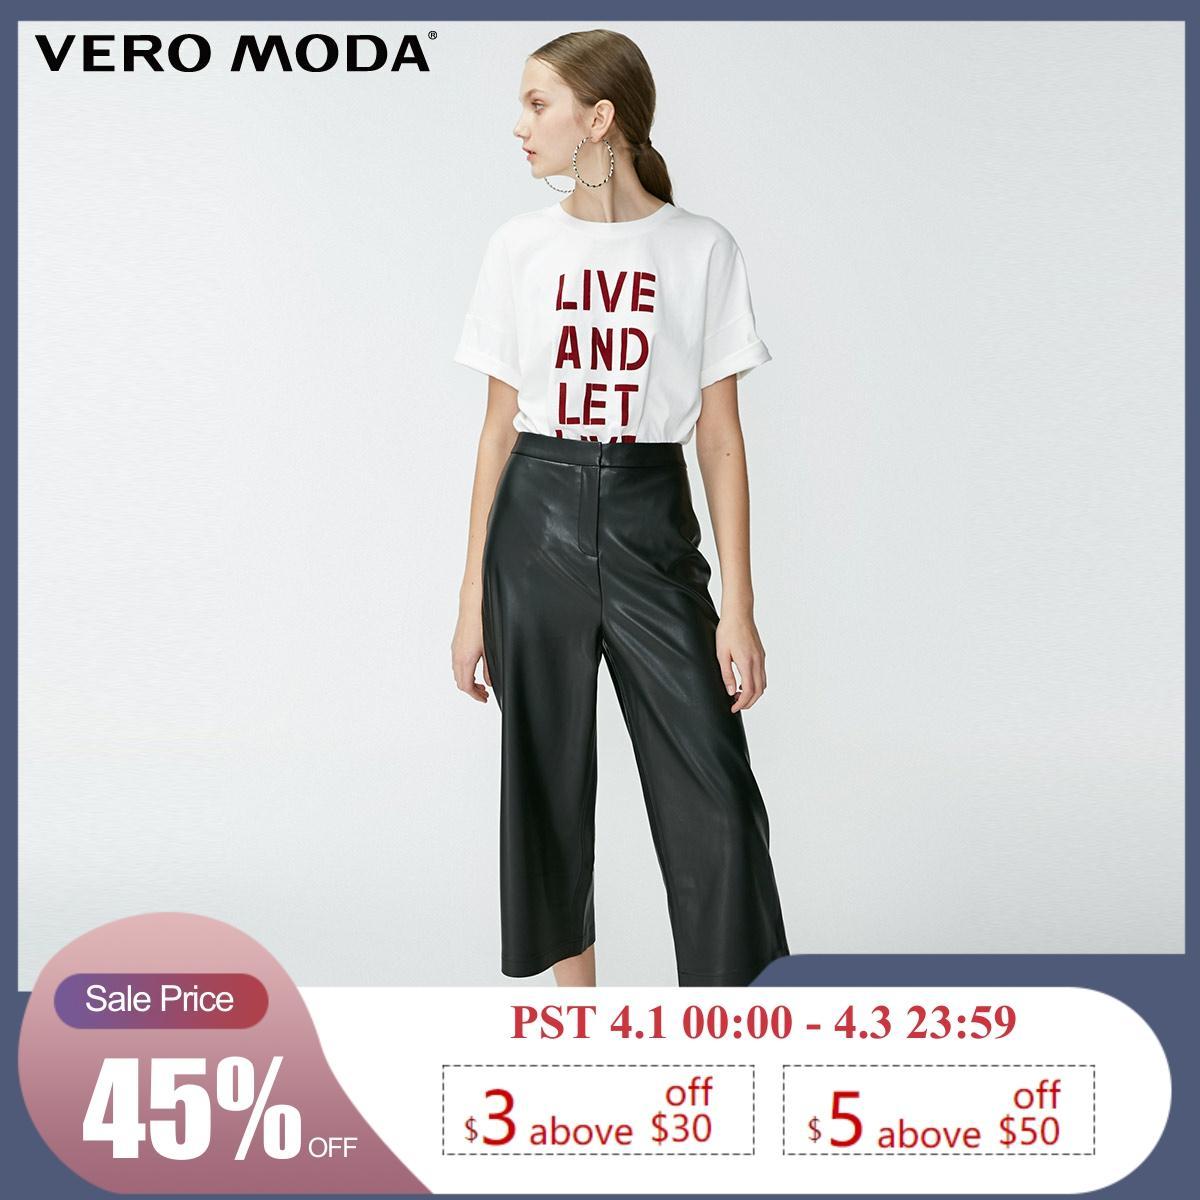 Vero Moda Women's Mid-rise Synthetic Leather Wide-leg Capri Pants   31916J521